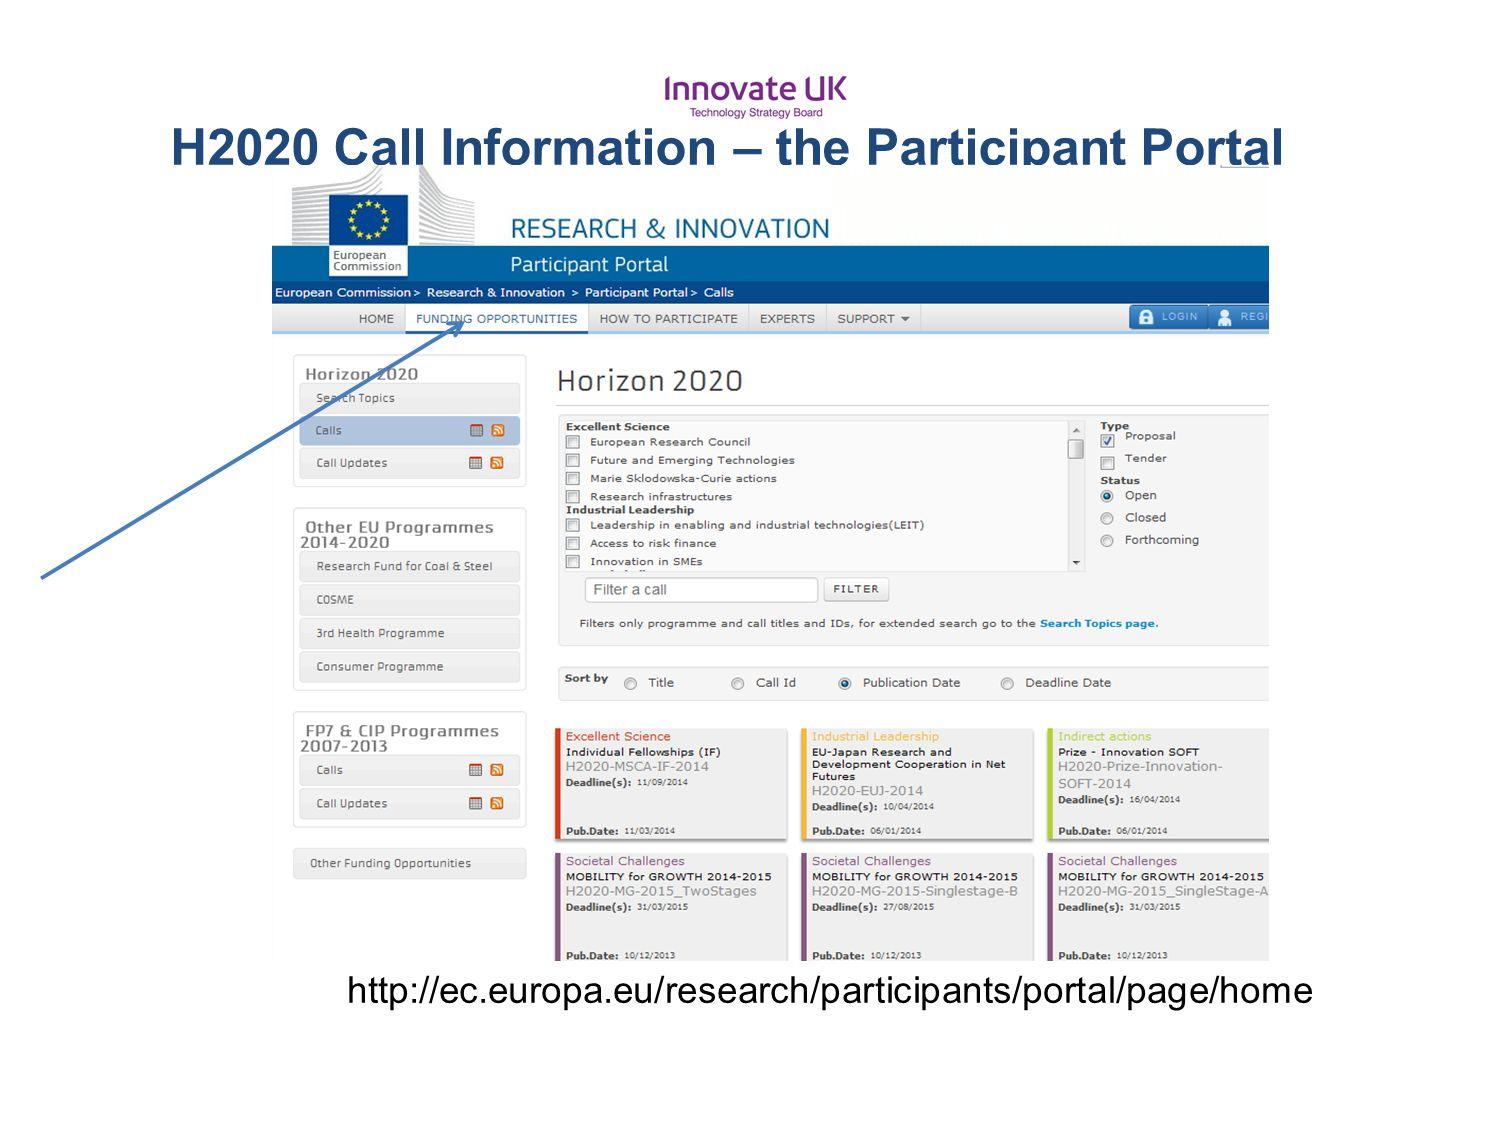 H2020 Call Information – the Participant Portal http://ec.europa.eu/research/participants/portal/page/home